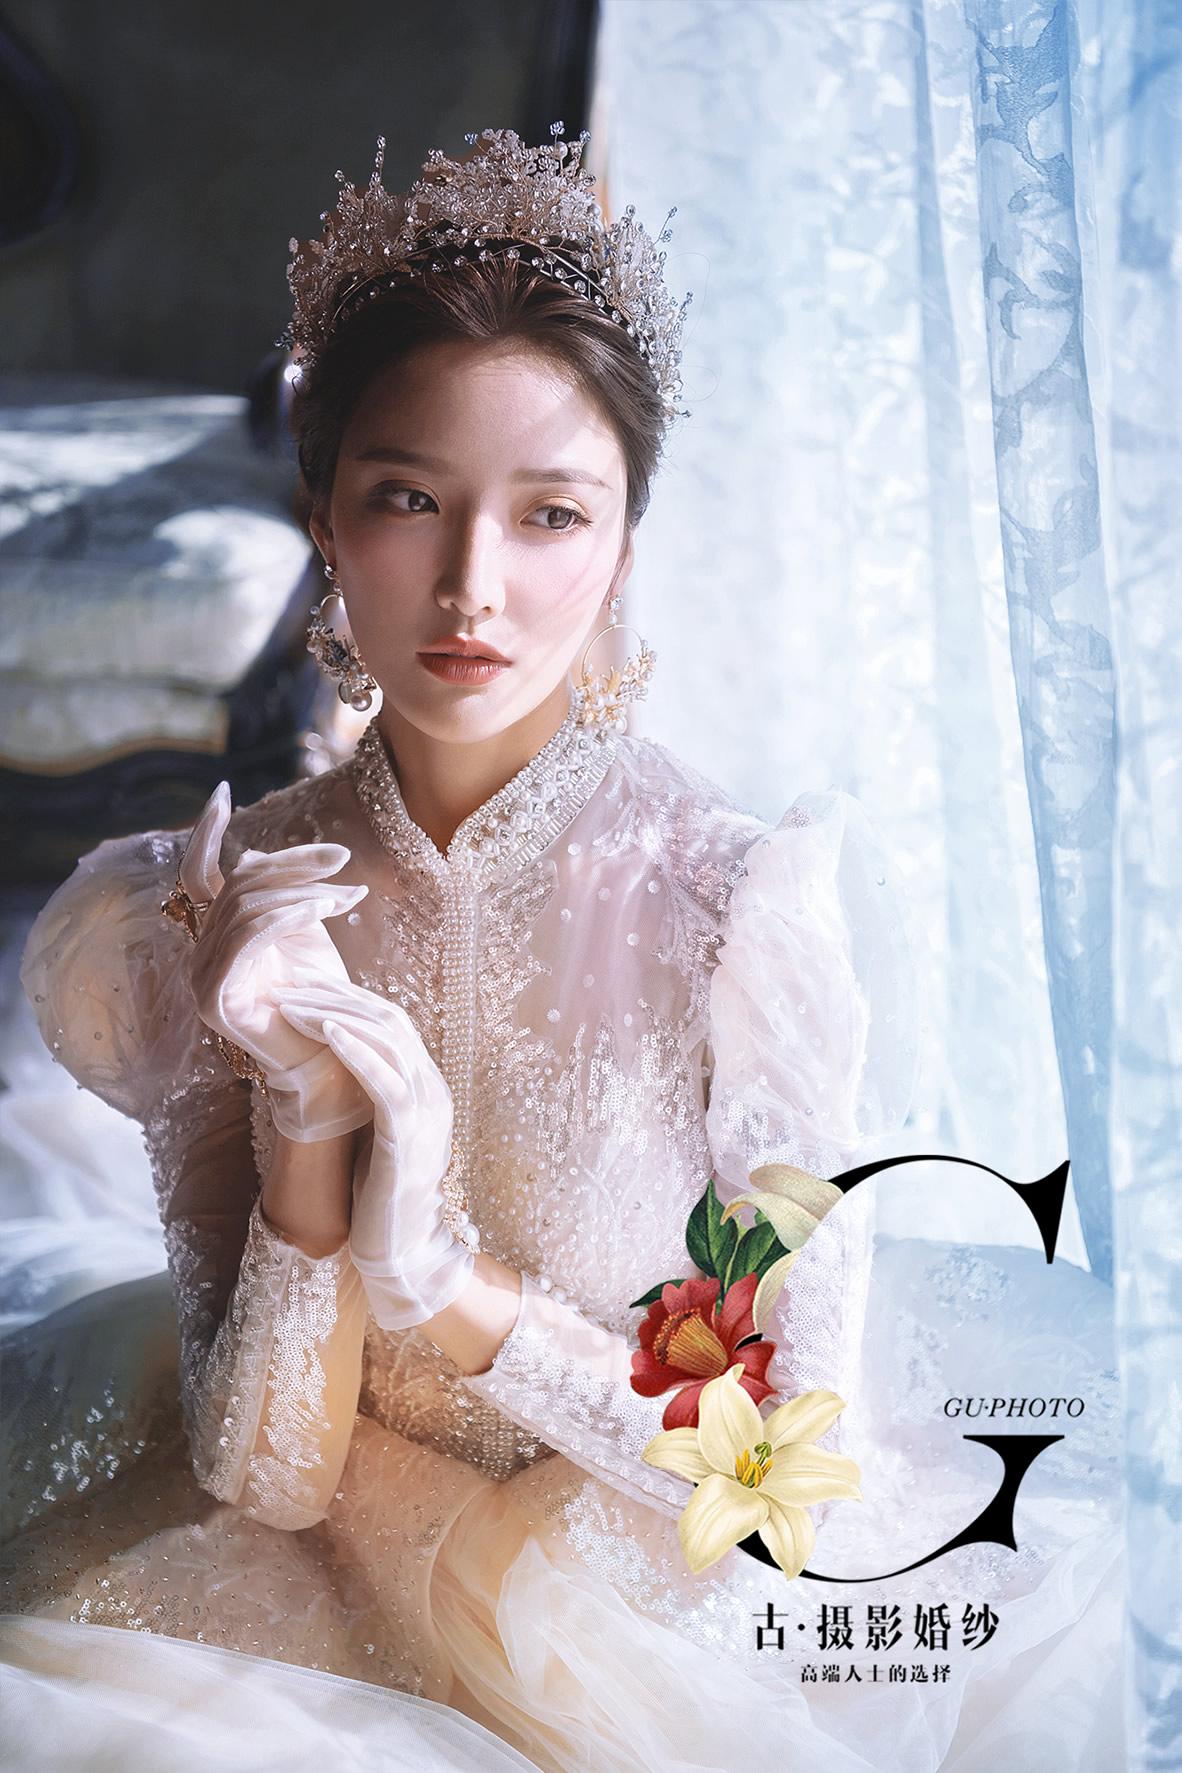 KING'S GARDEN《国王宫殿》 - 拍摄地 - 广州婚纱摄影-广州古摄影官网